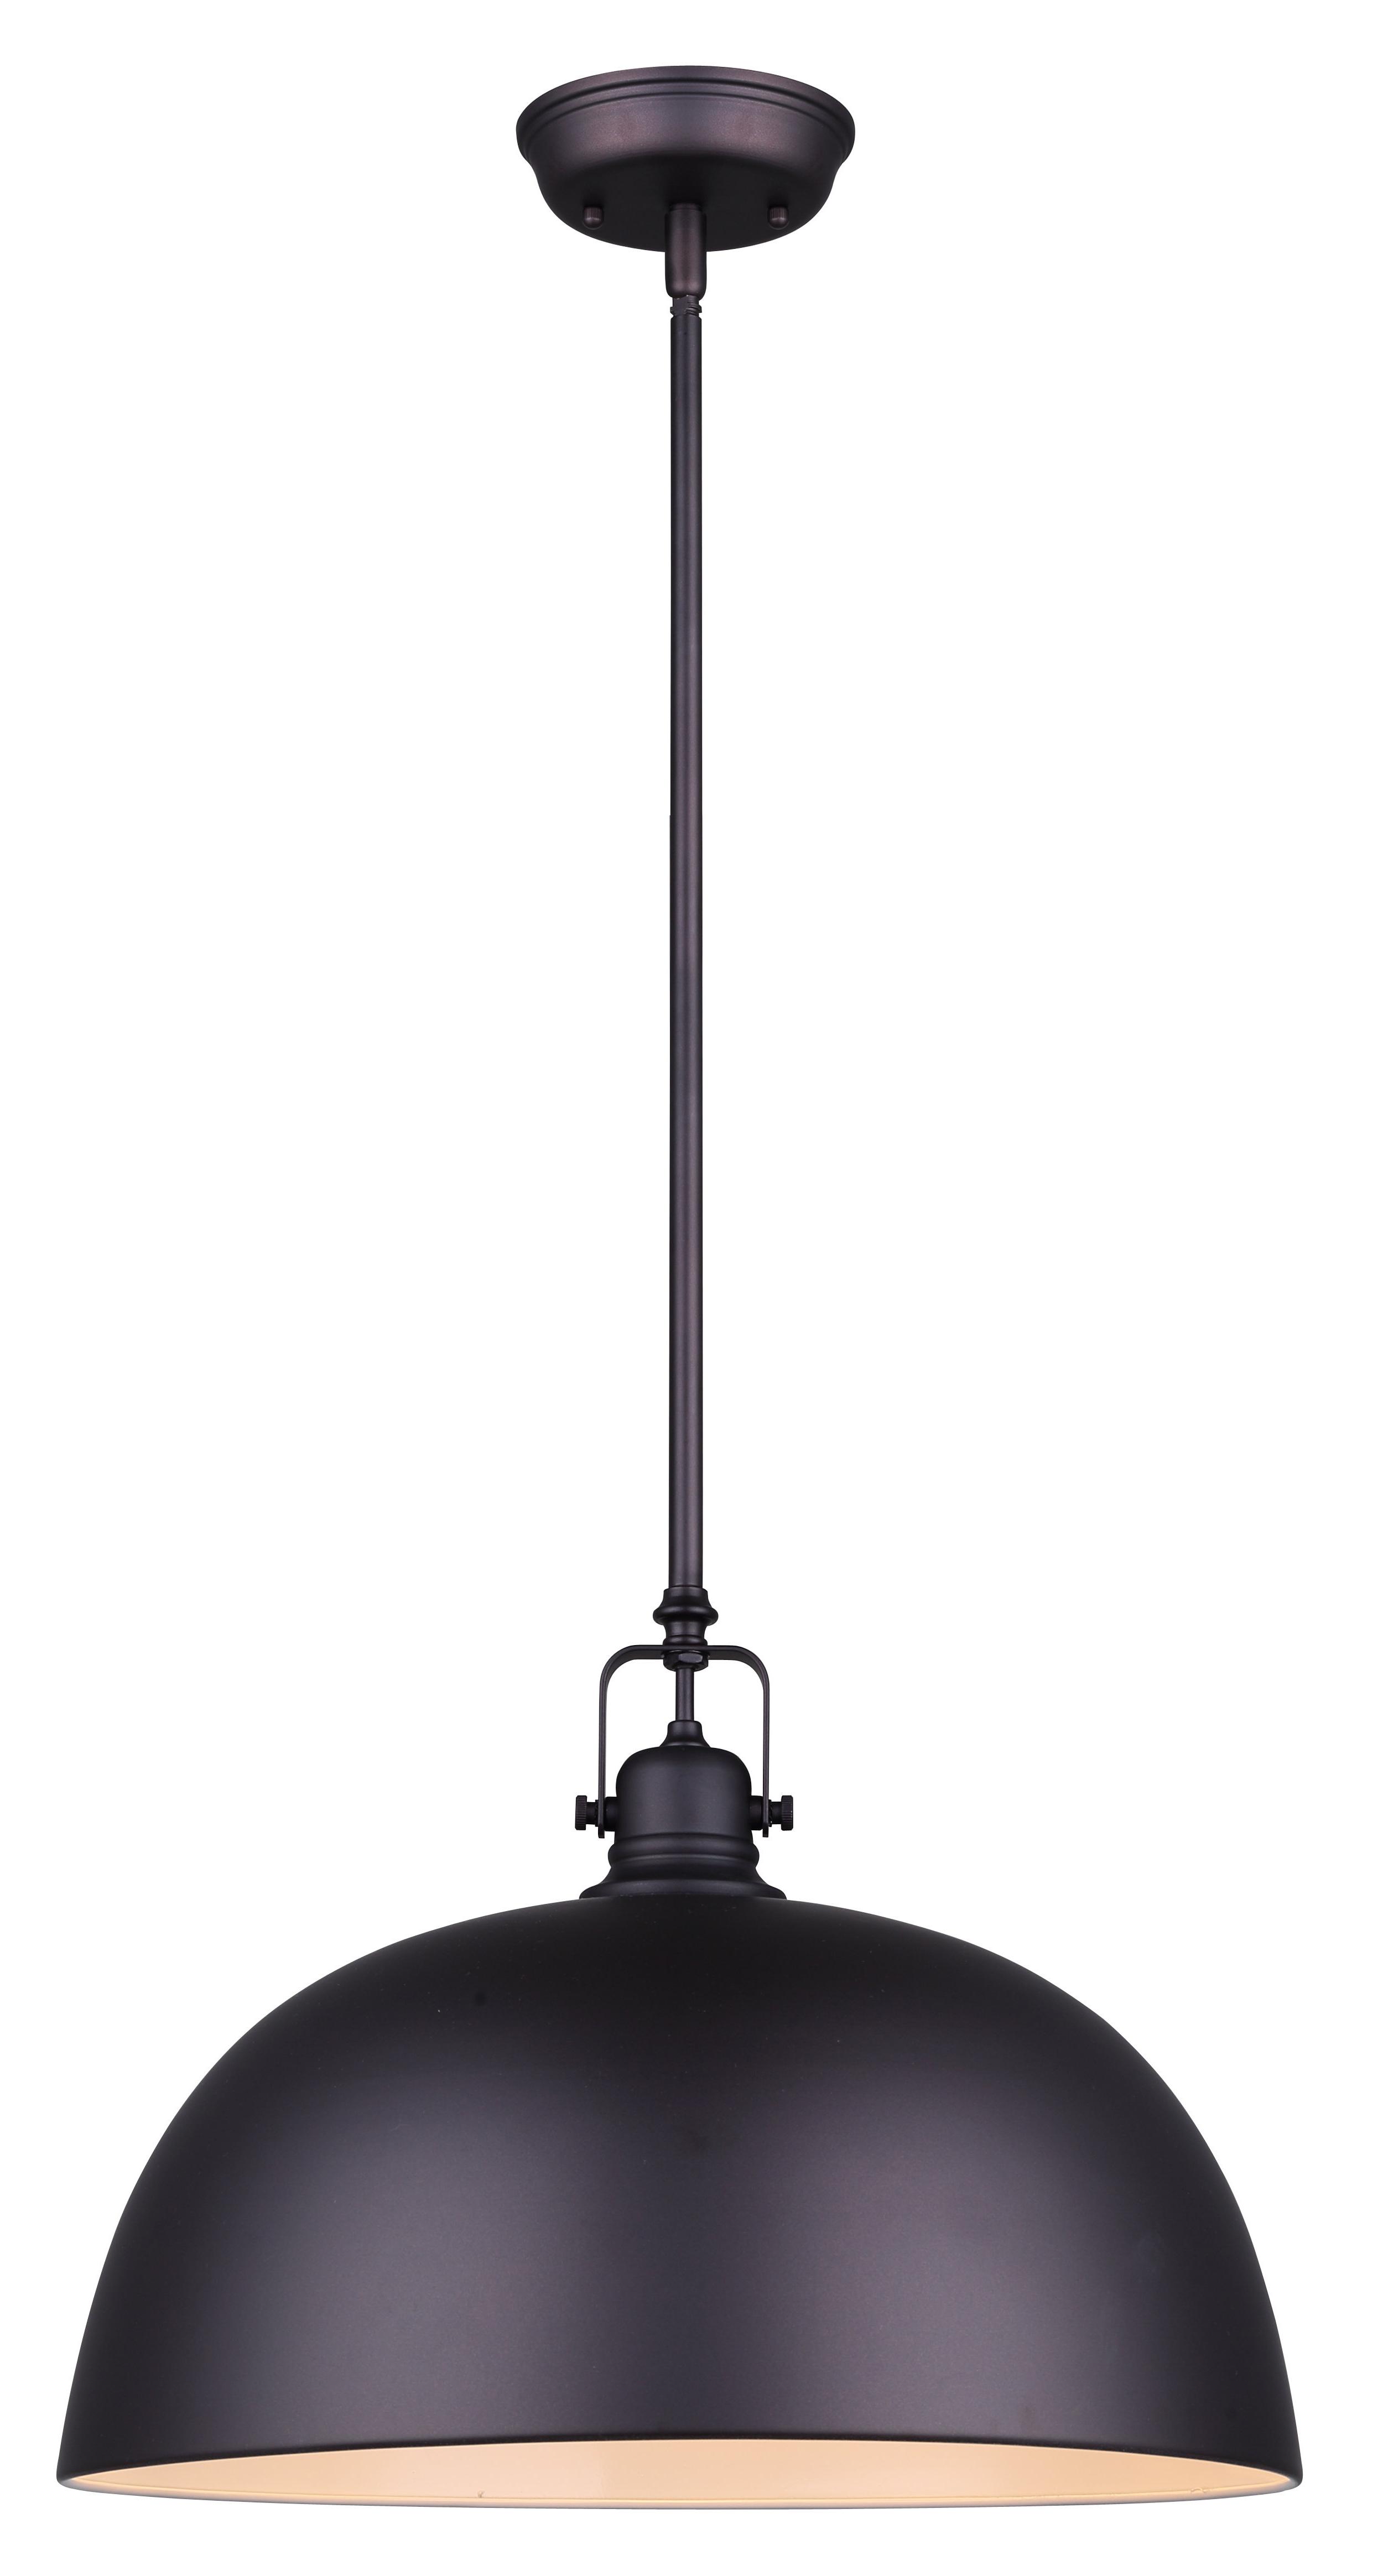 2019 Southlake 1 Light Single Dome Pendant With 1 Light Single Dome Pendants (View 5 of 25)